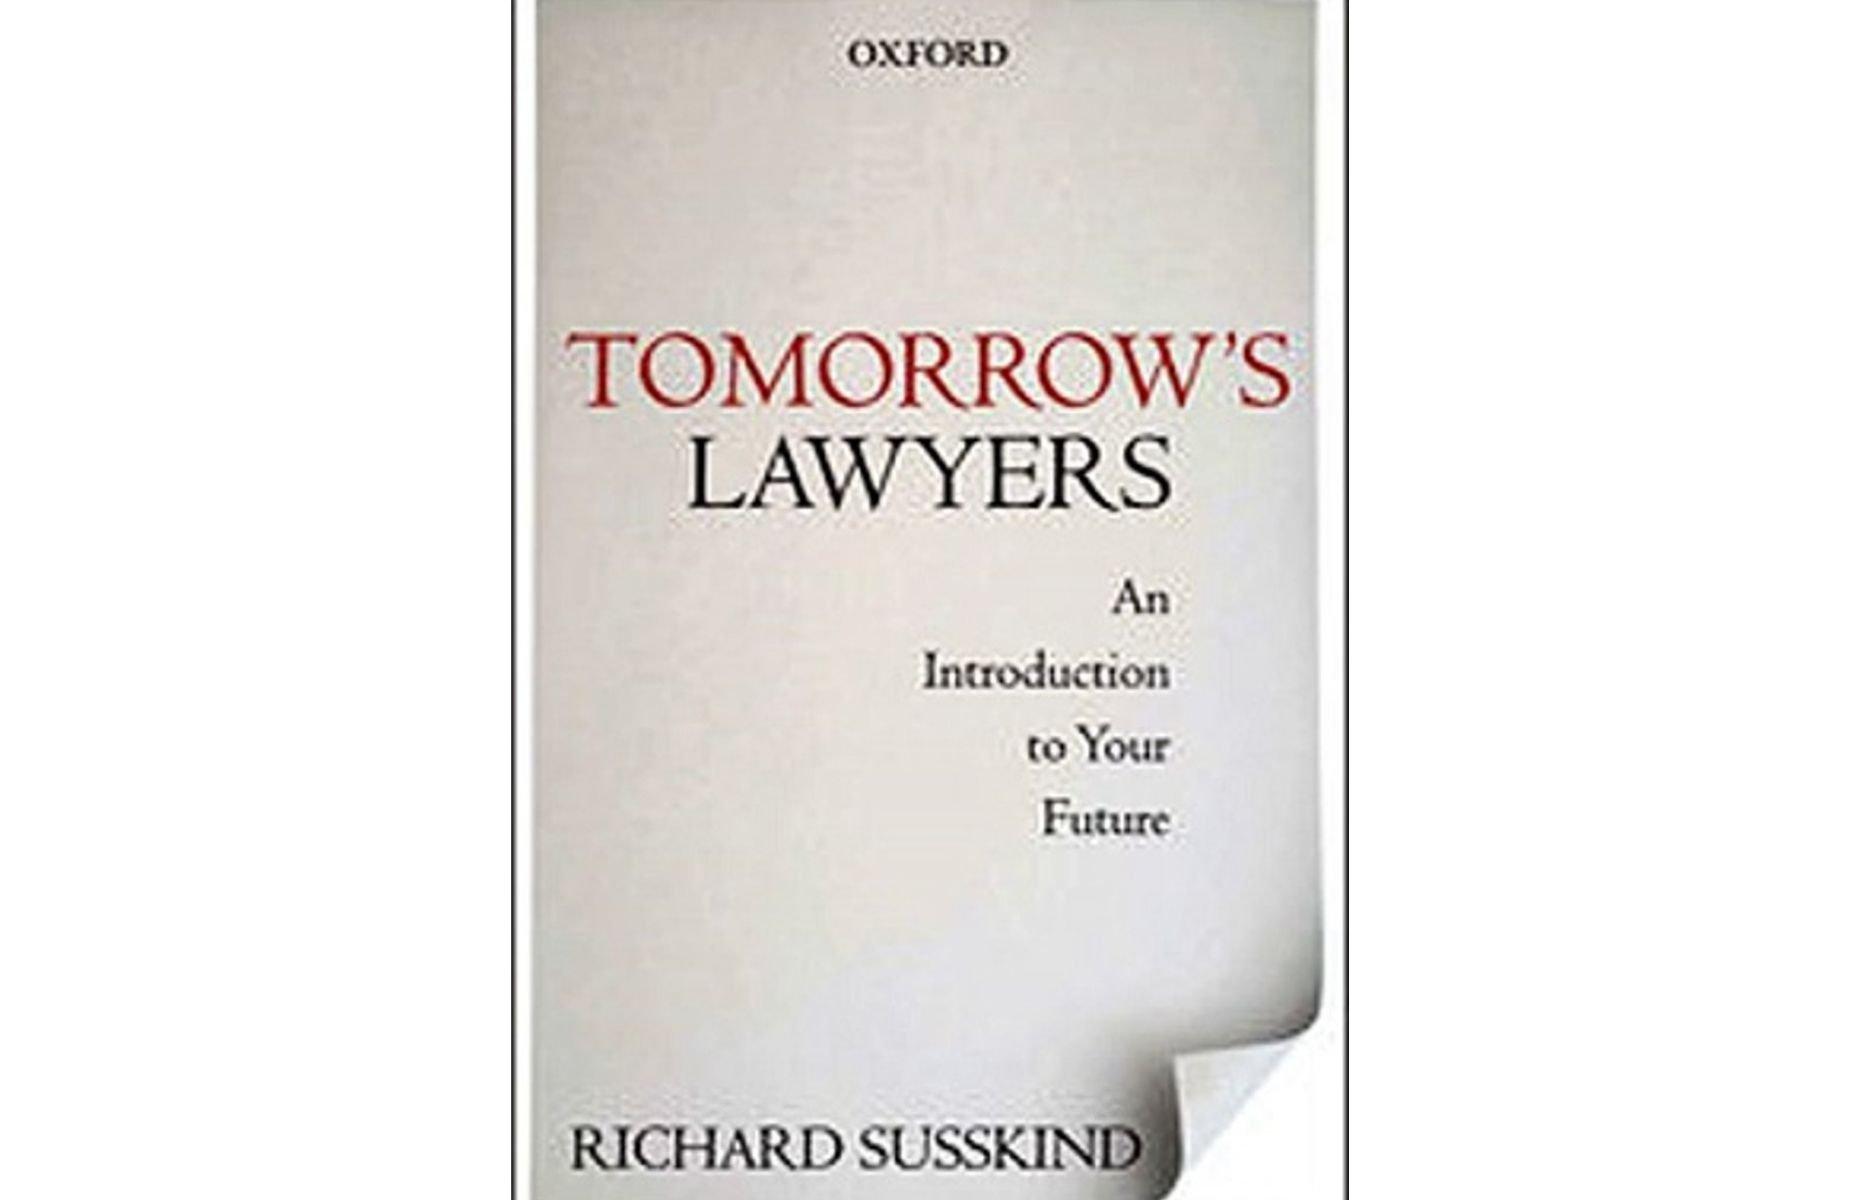 #4 Tomorrows-Lawyer